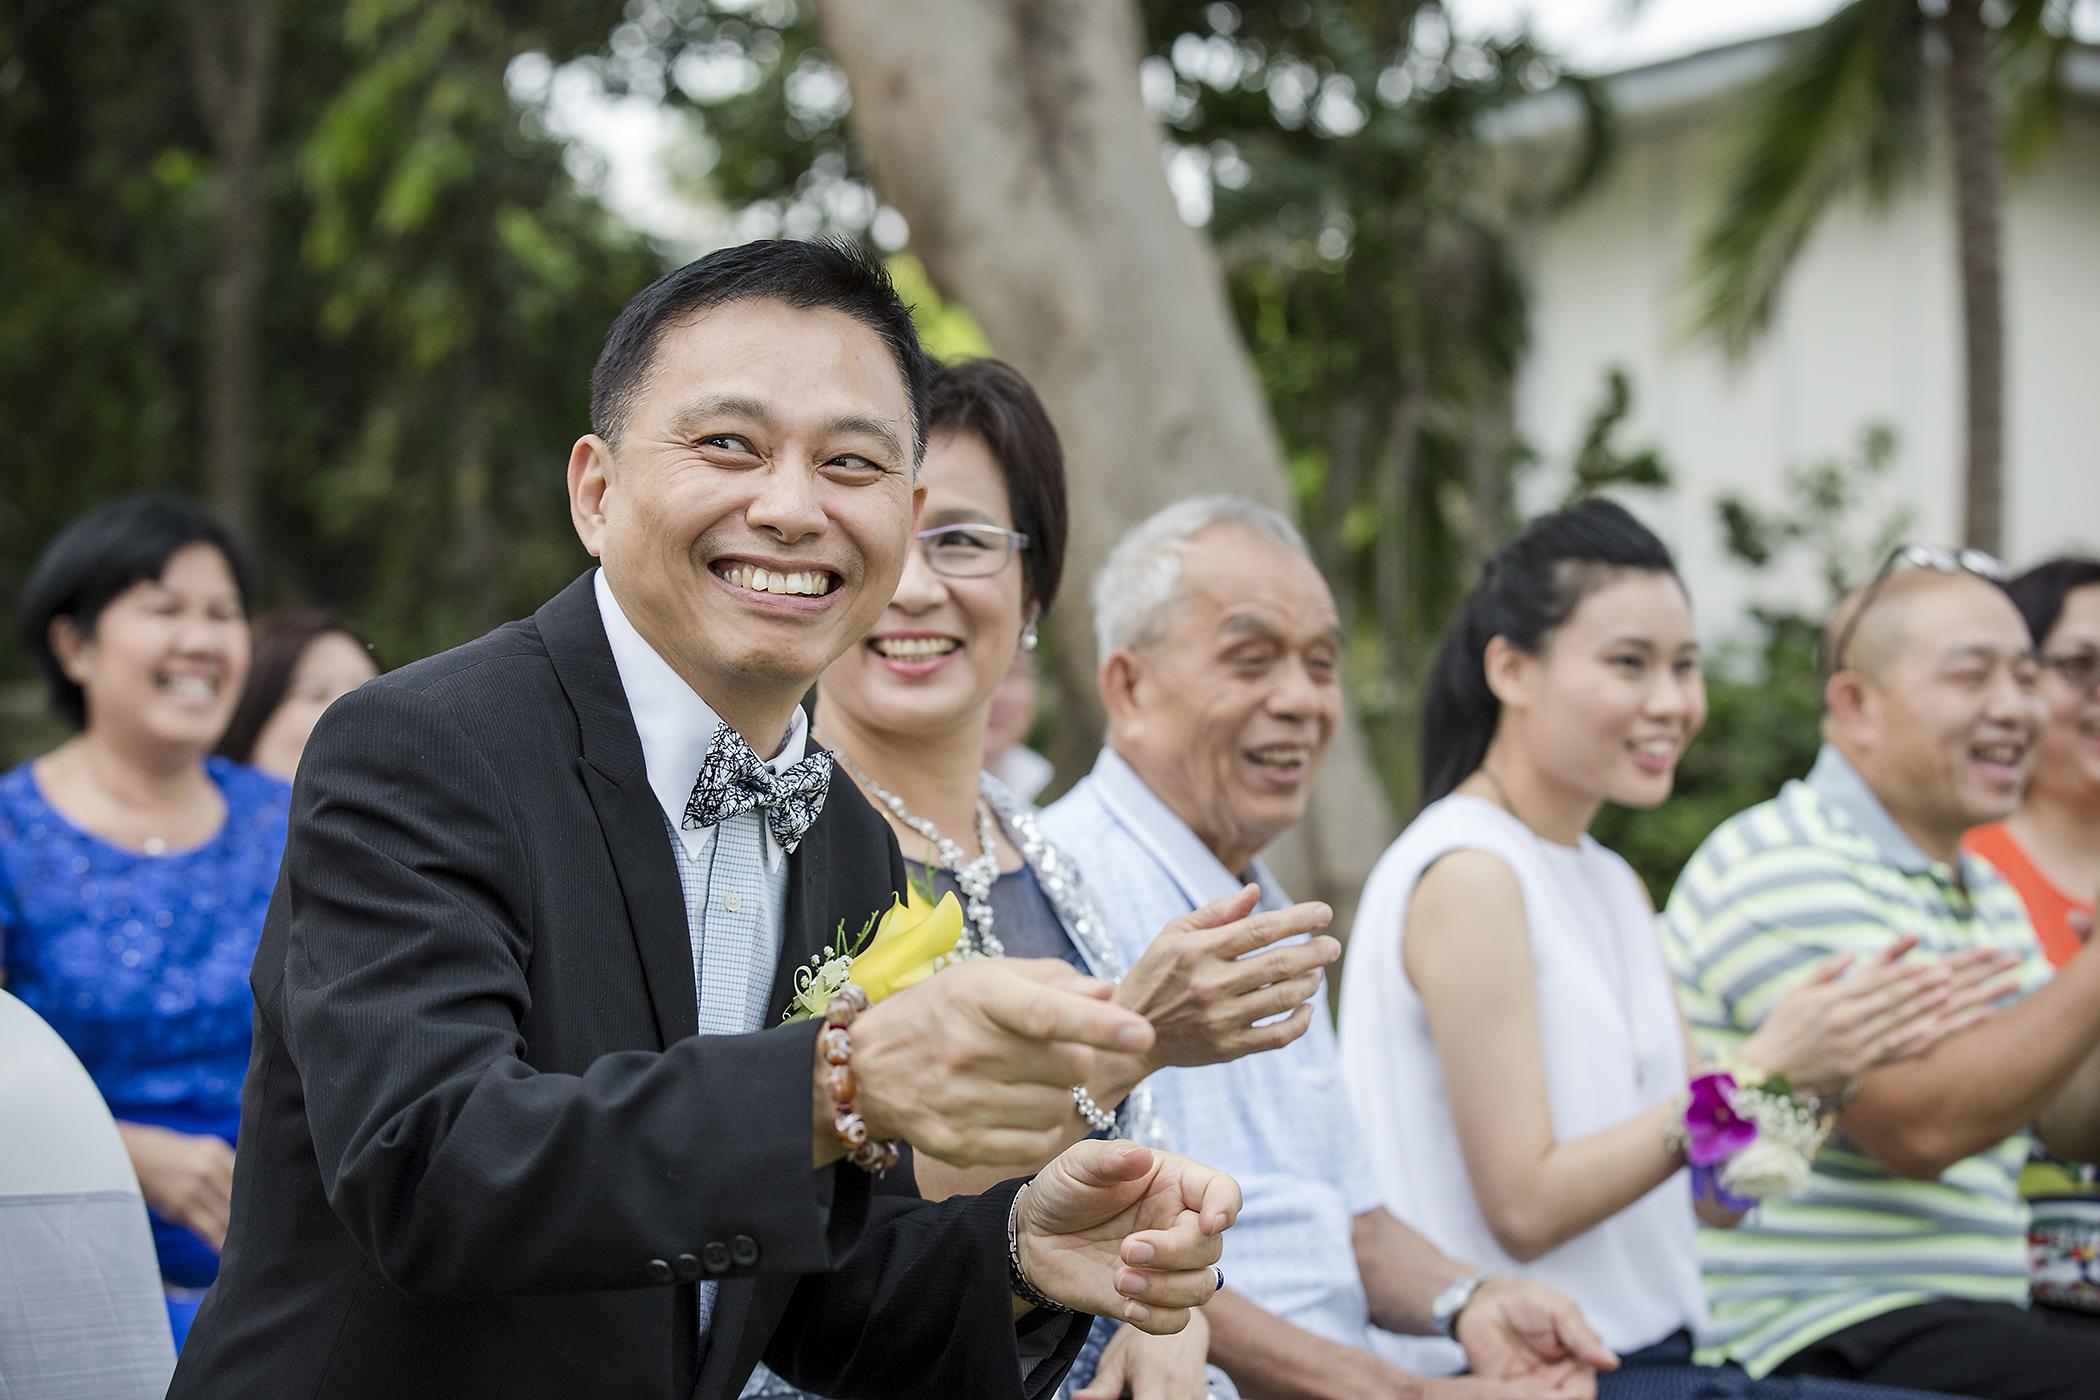 moe-keith-wedding-2.jpg